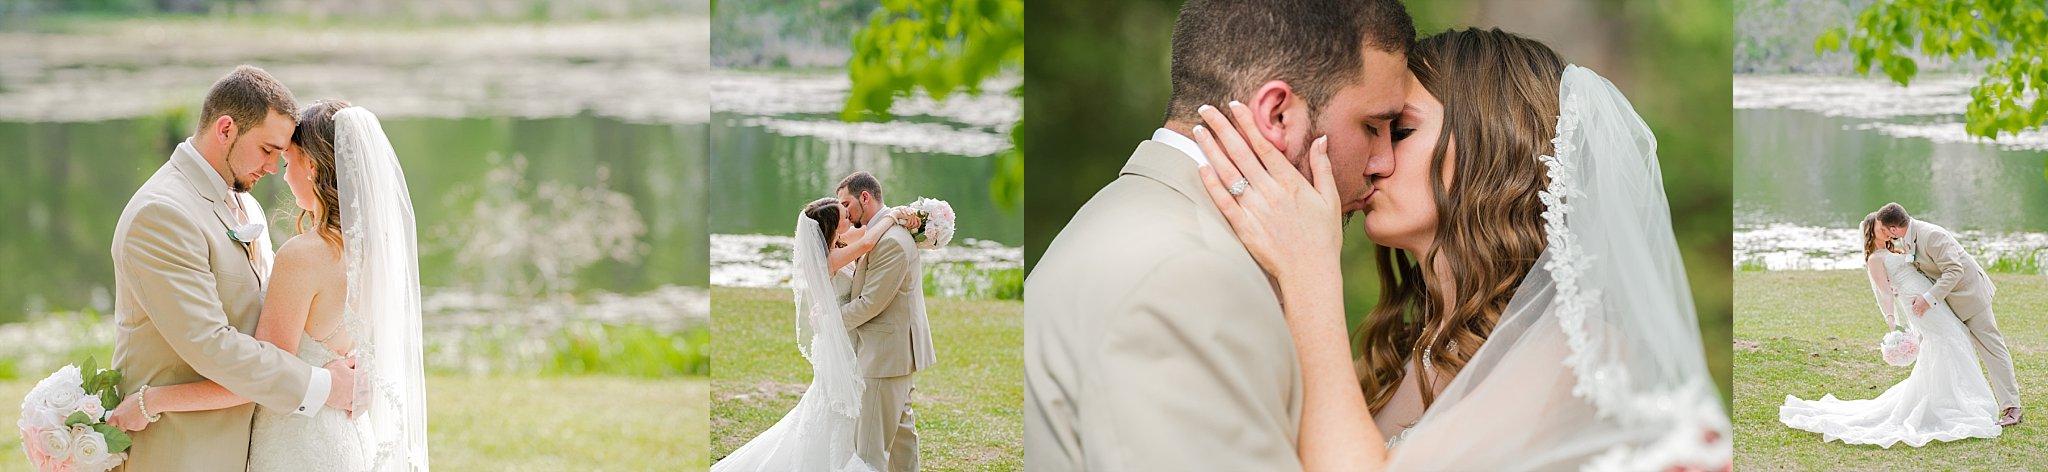 Amber and Logan Orangeburg Wedding